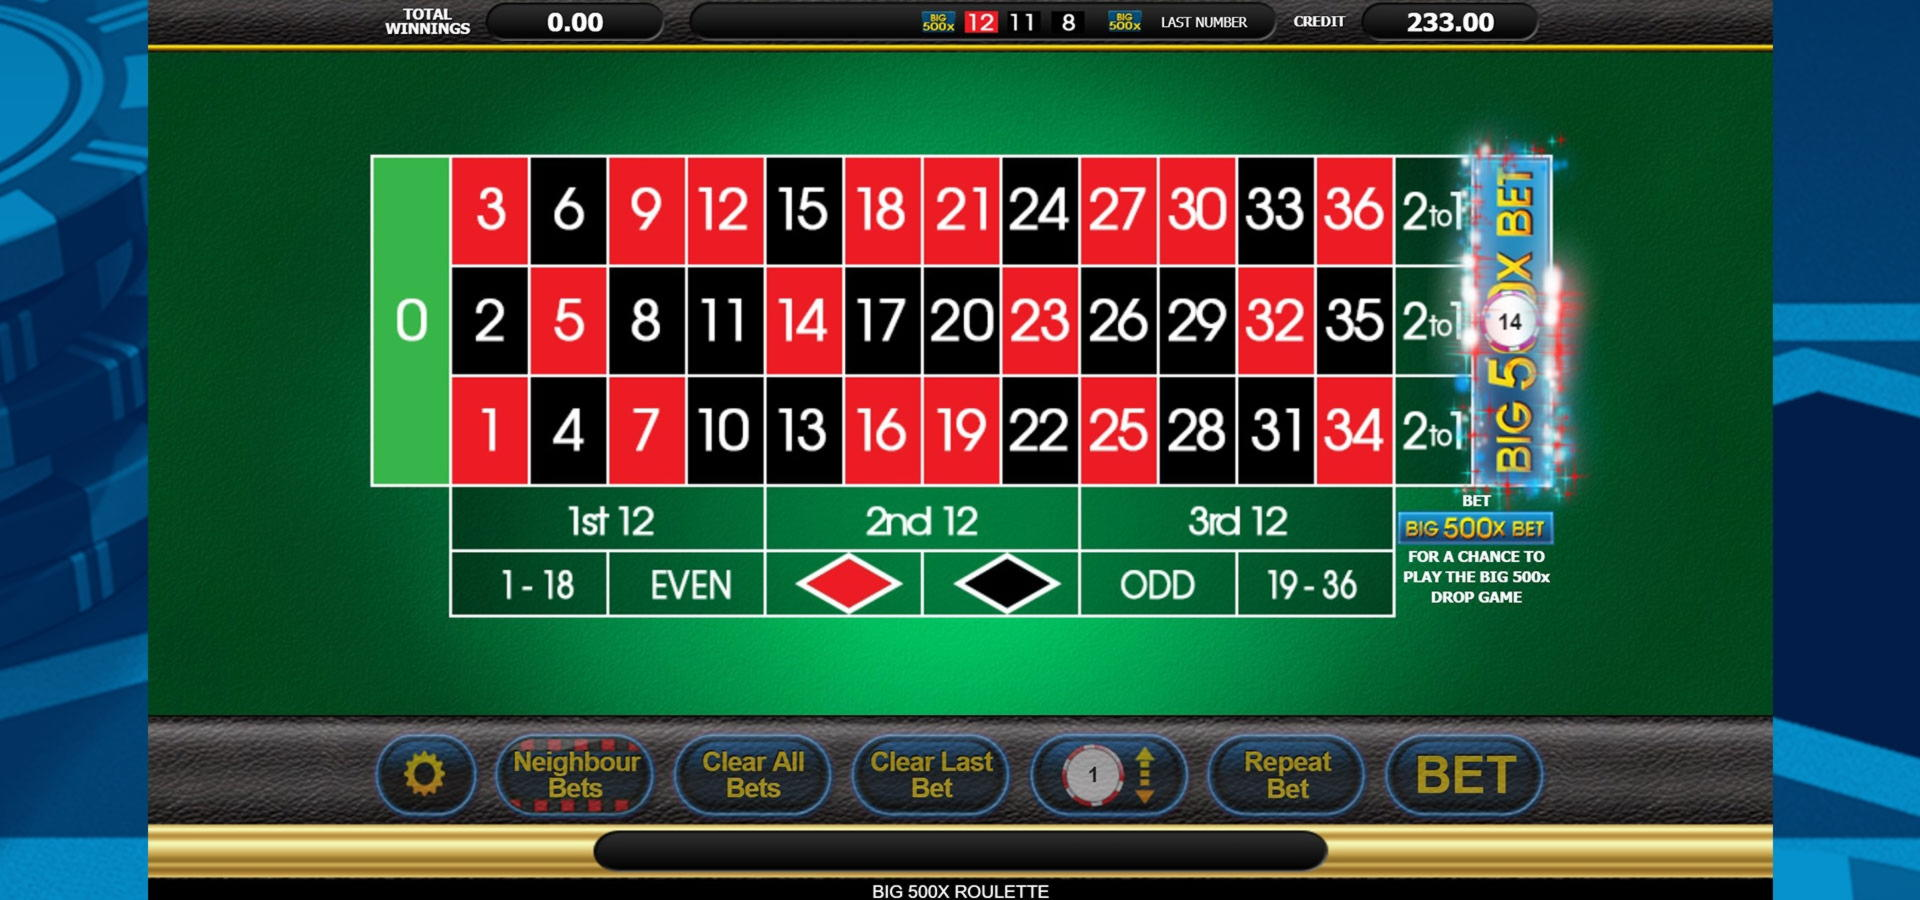 44 free spins casino at Finland Casino